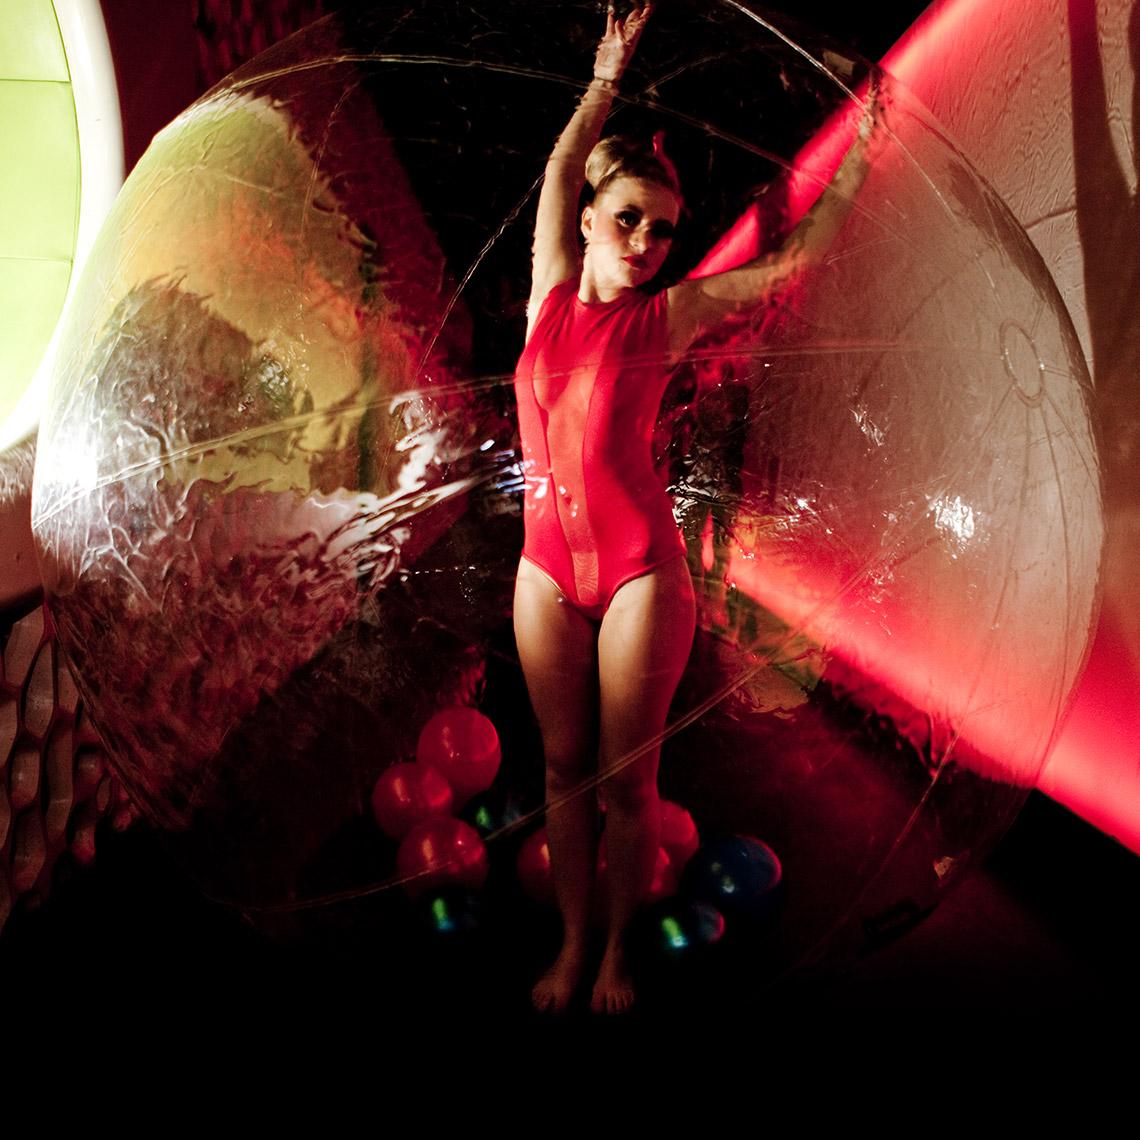 ENVY Project - Red Monday - Bonus Image